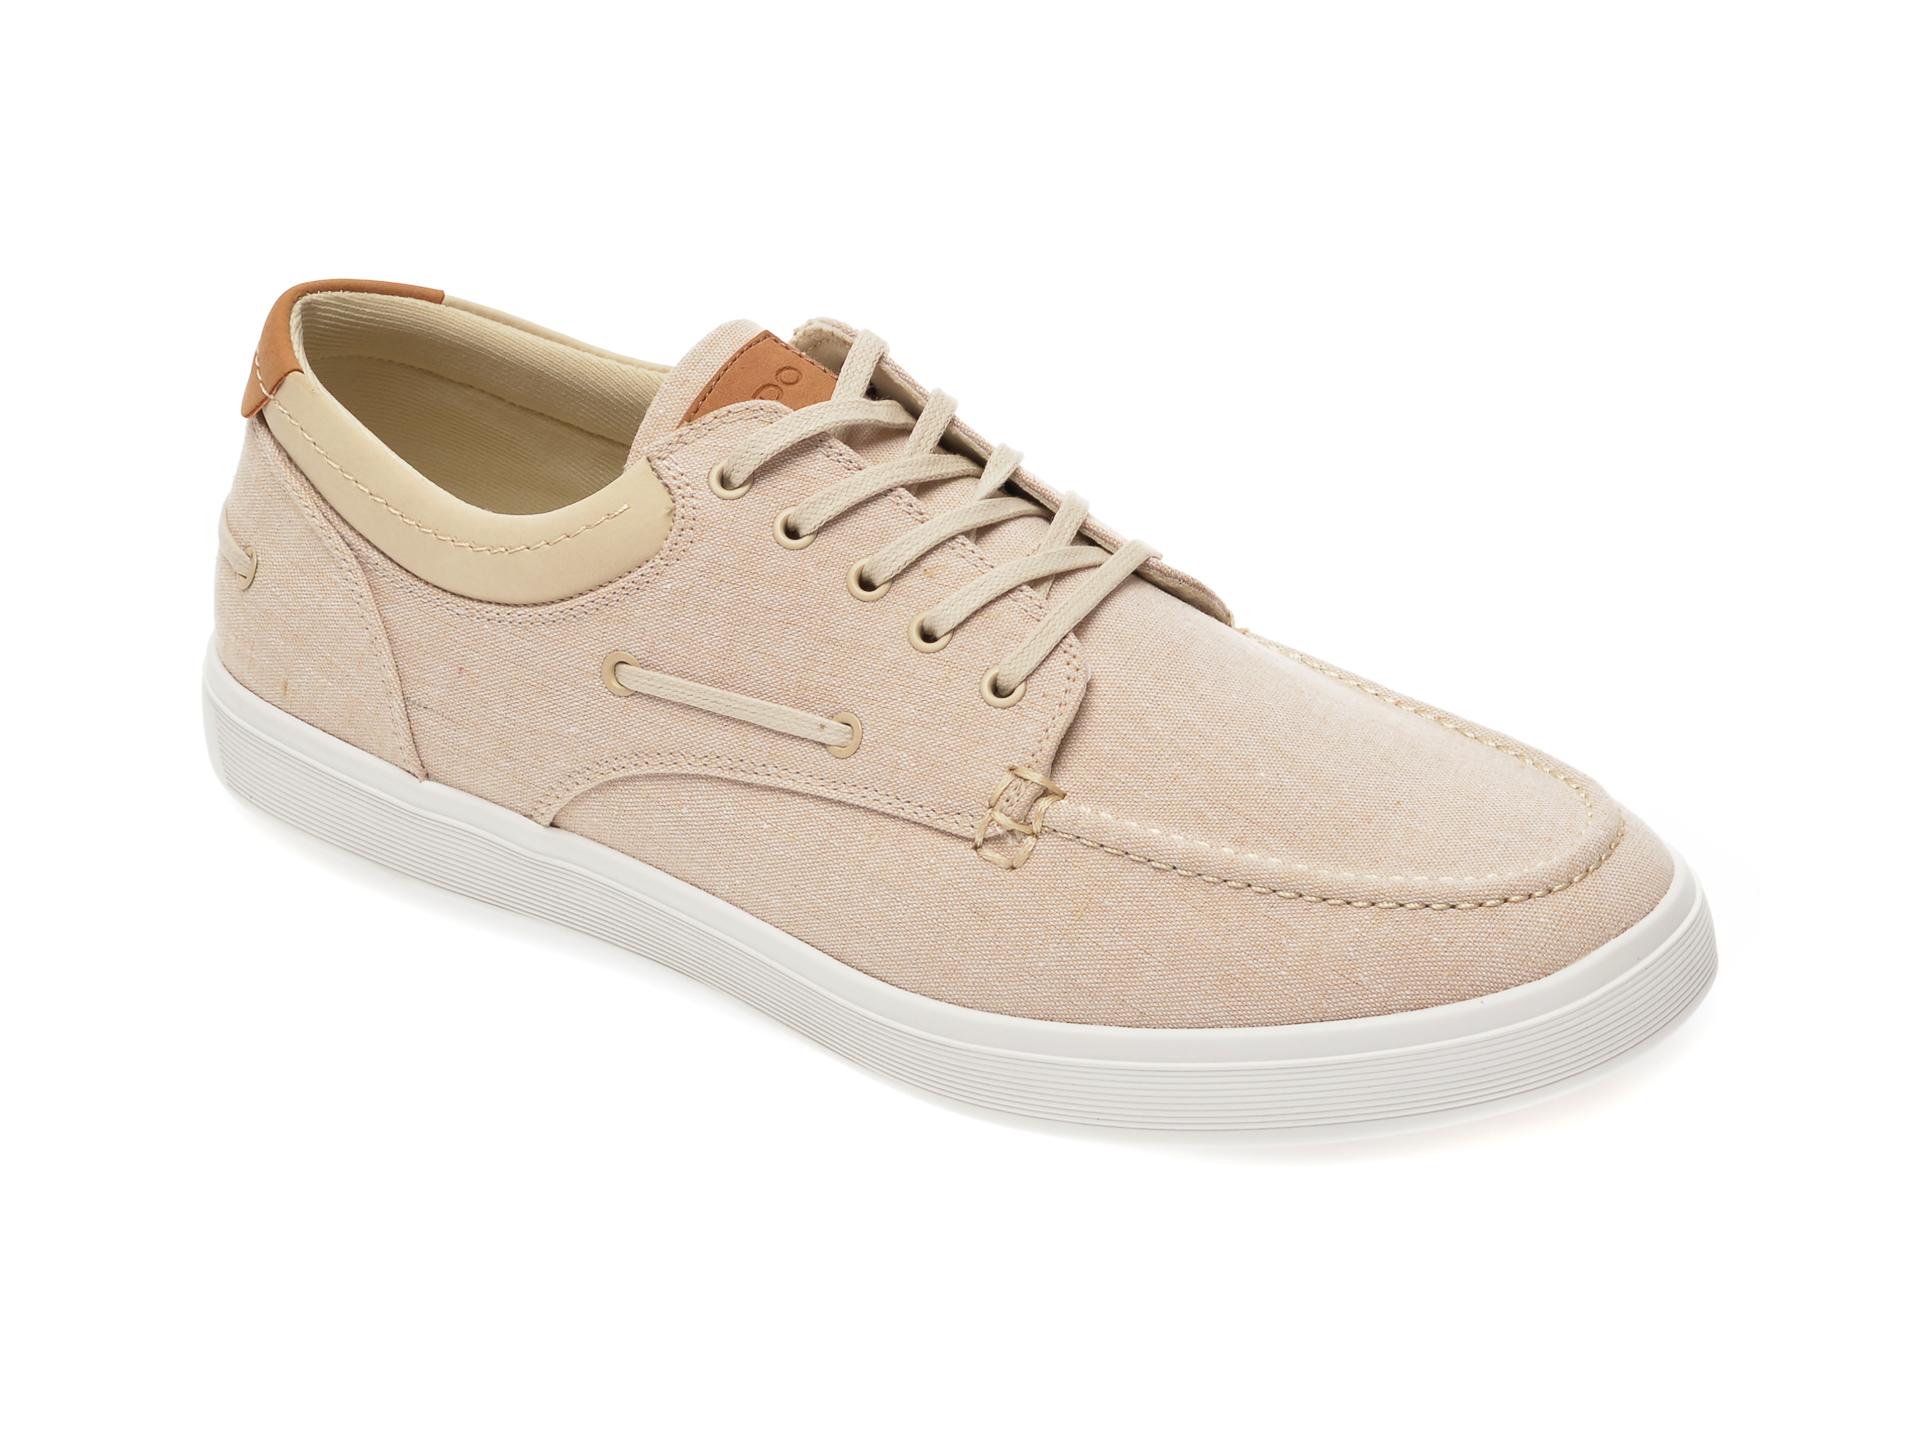 Pantofi ALDO bej, Bridleholme271, din material textil New